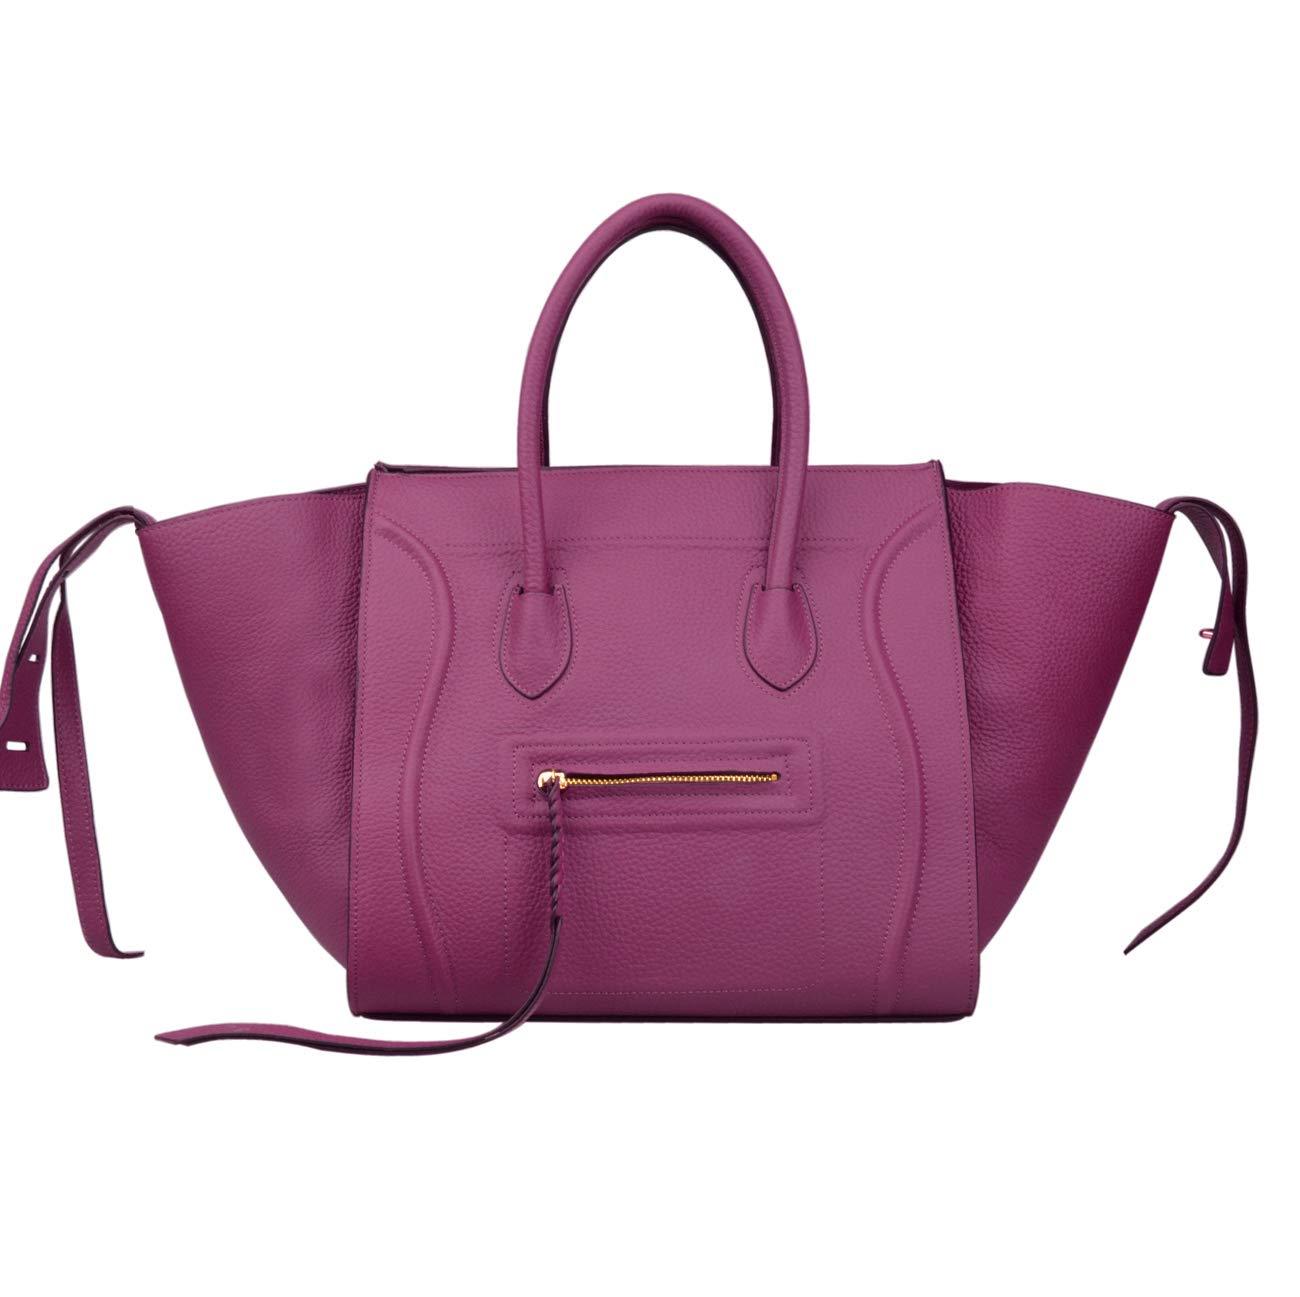 Ainifeel Women's Genuine Leather Bat Oversize Tote Bag Purse Handbags (X-large (Oversize), Purple)